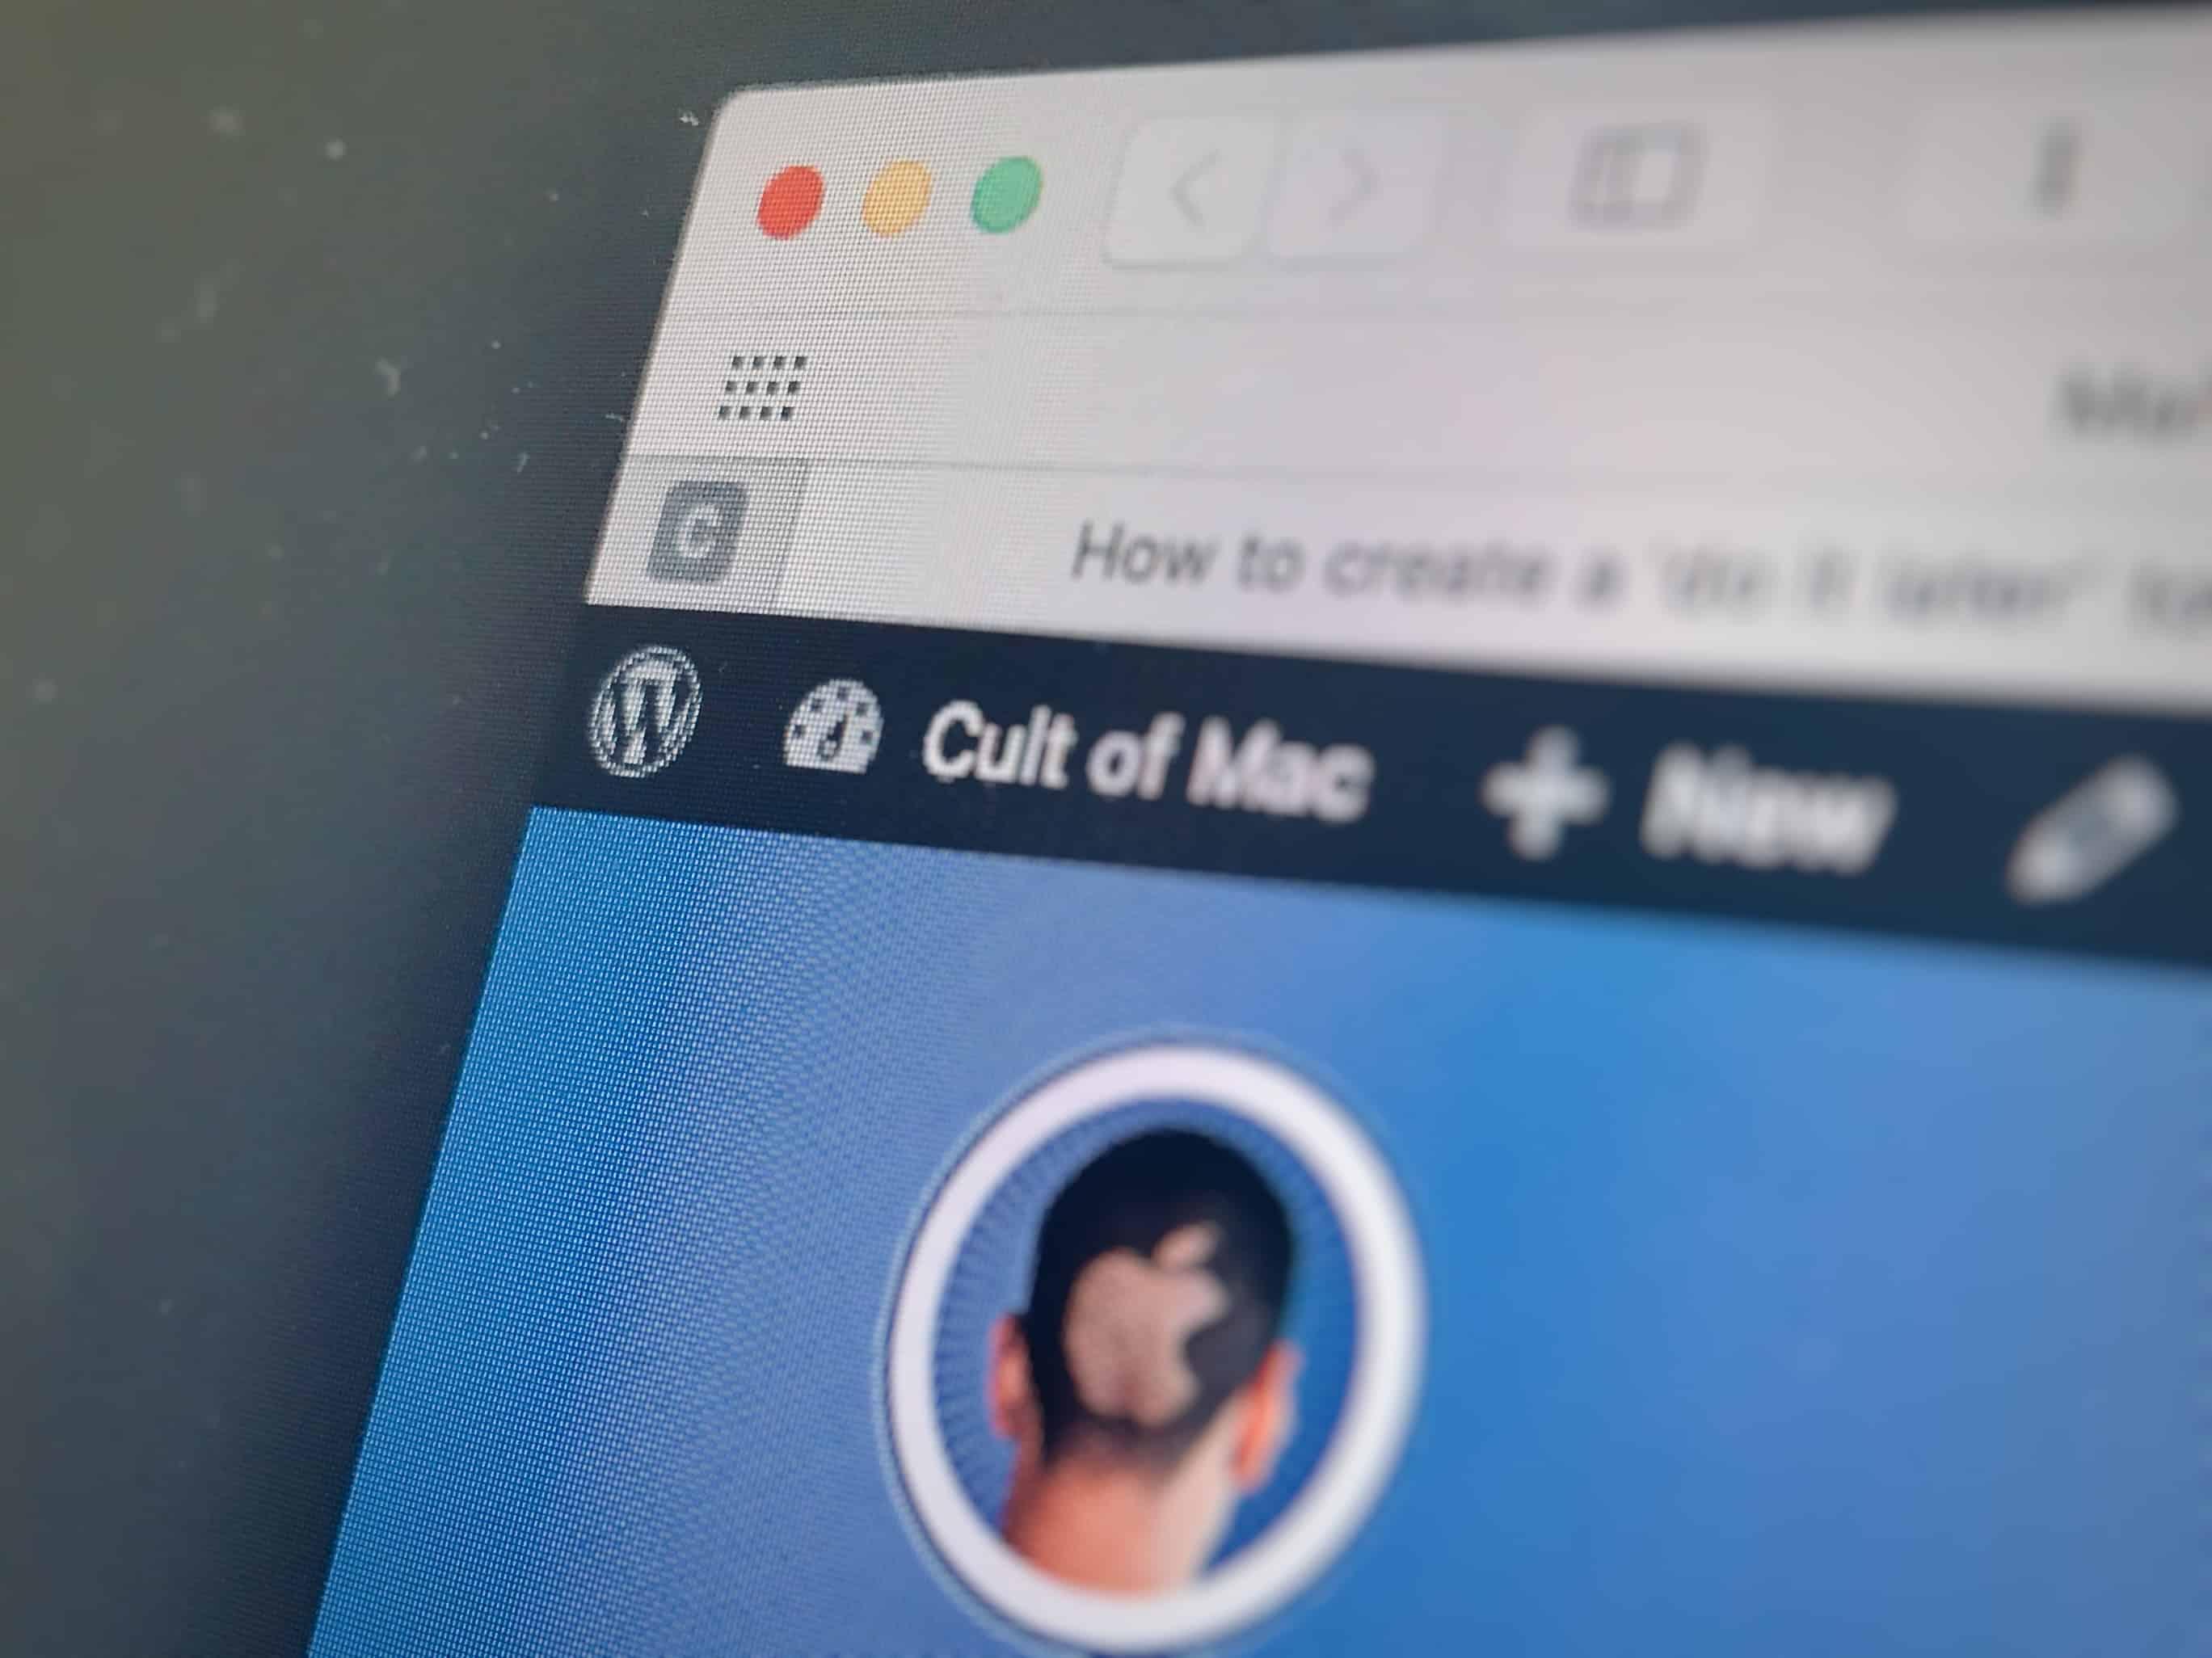 Firefox for mac 10.6.8